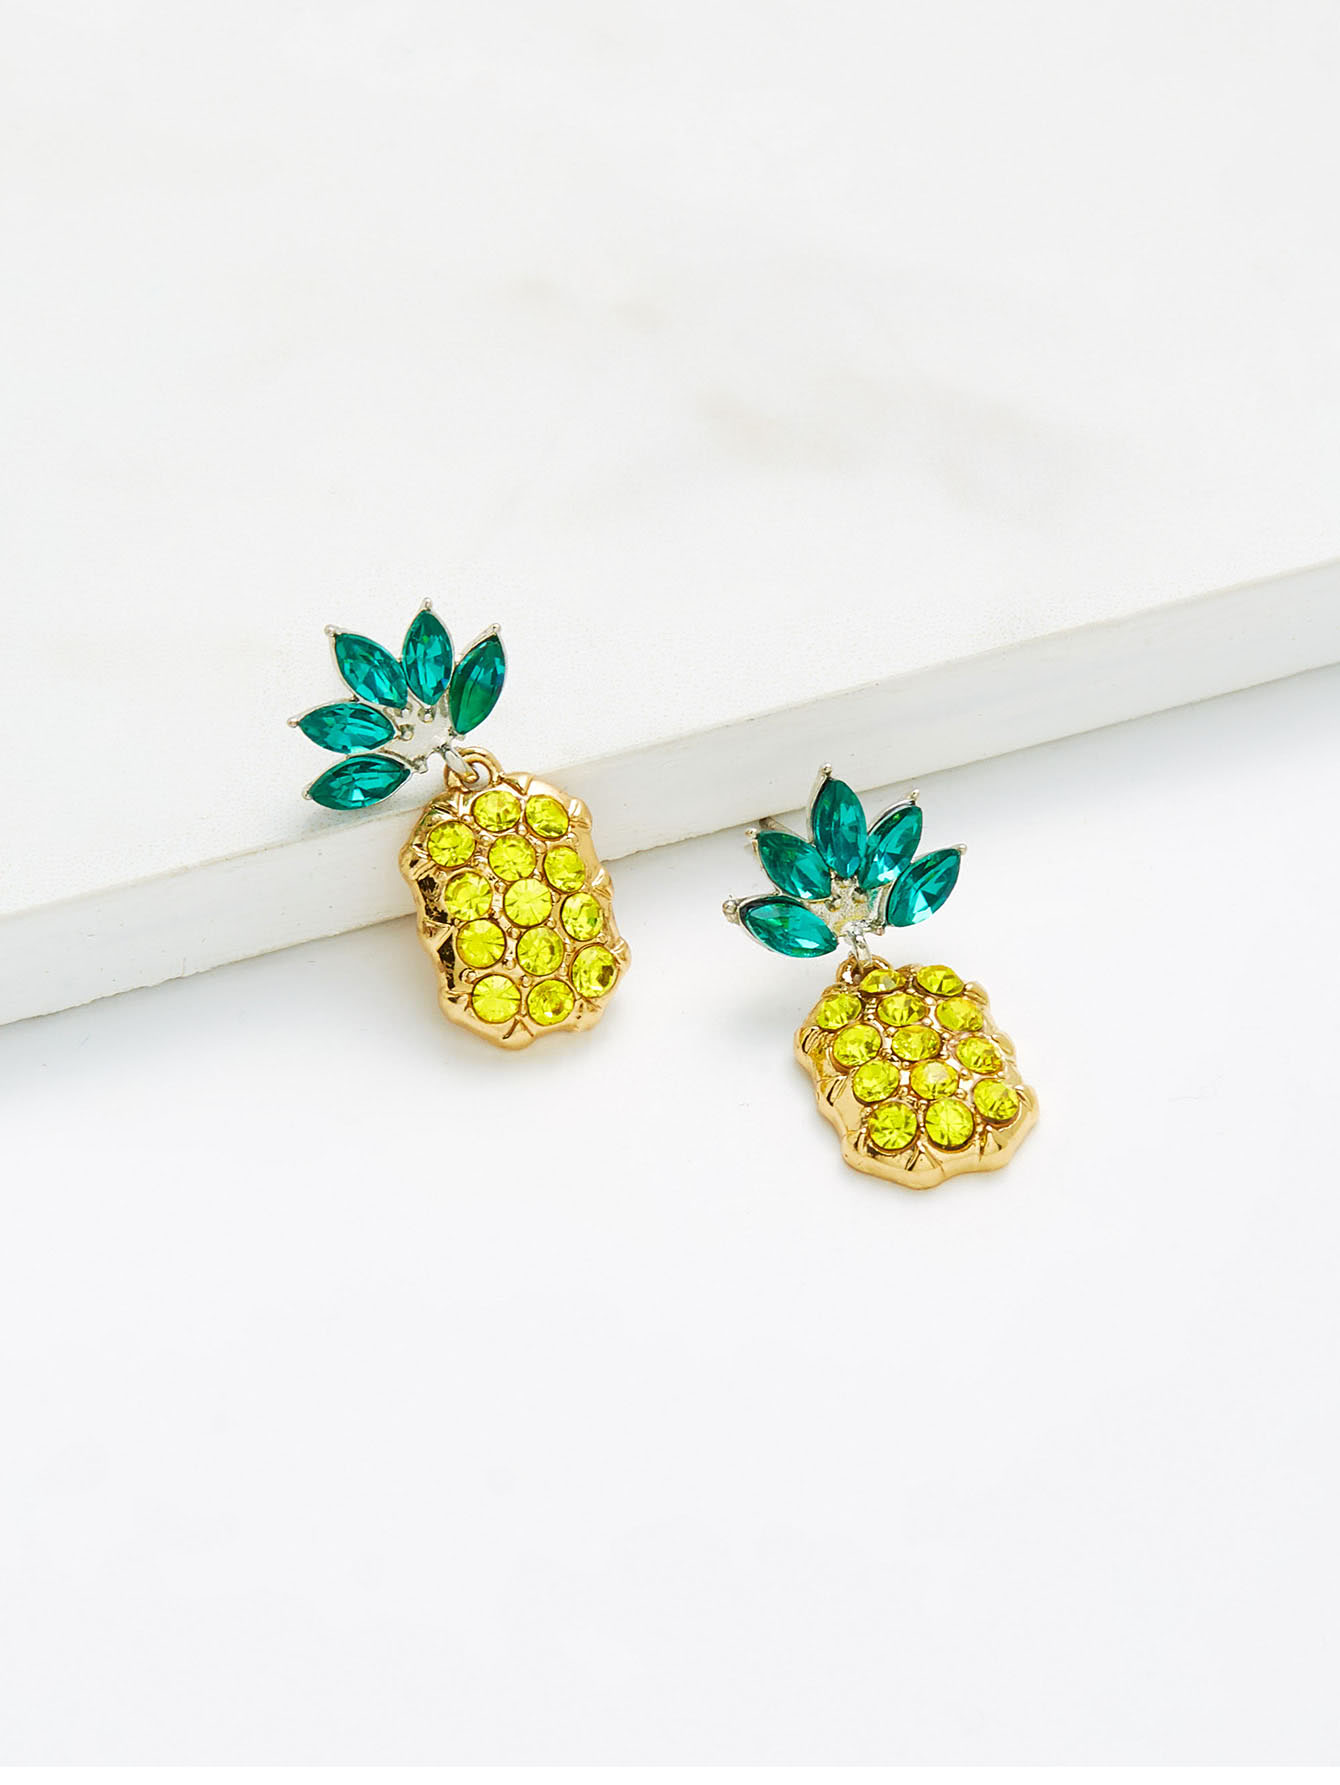 Rhinestone Overlay Pineapple Shaped Earrings pineapple shaped pu bag